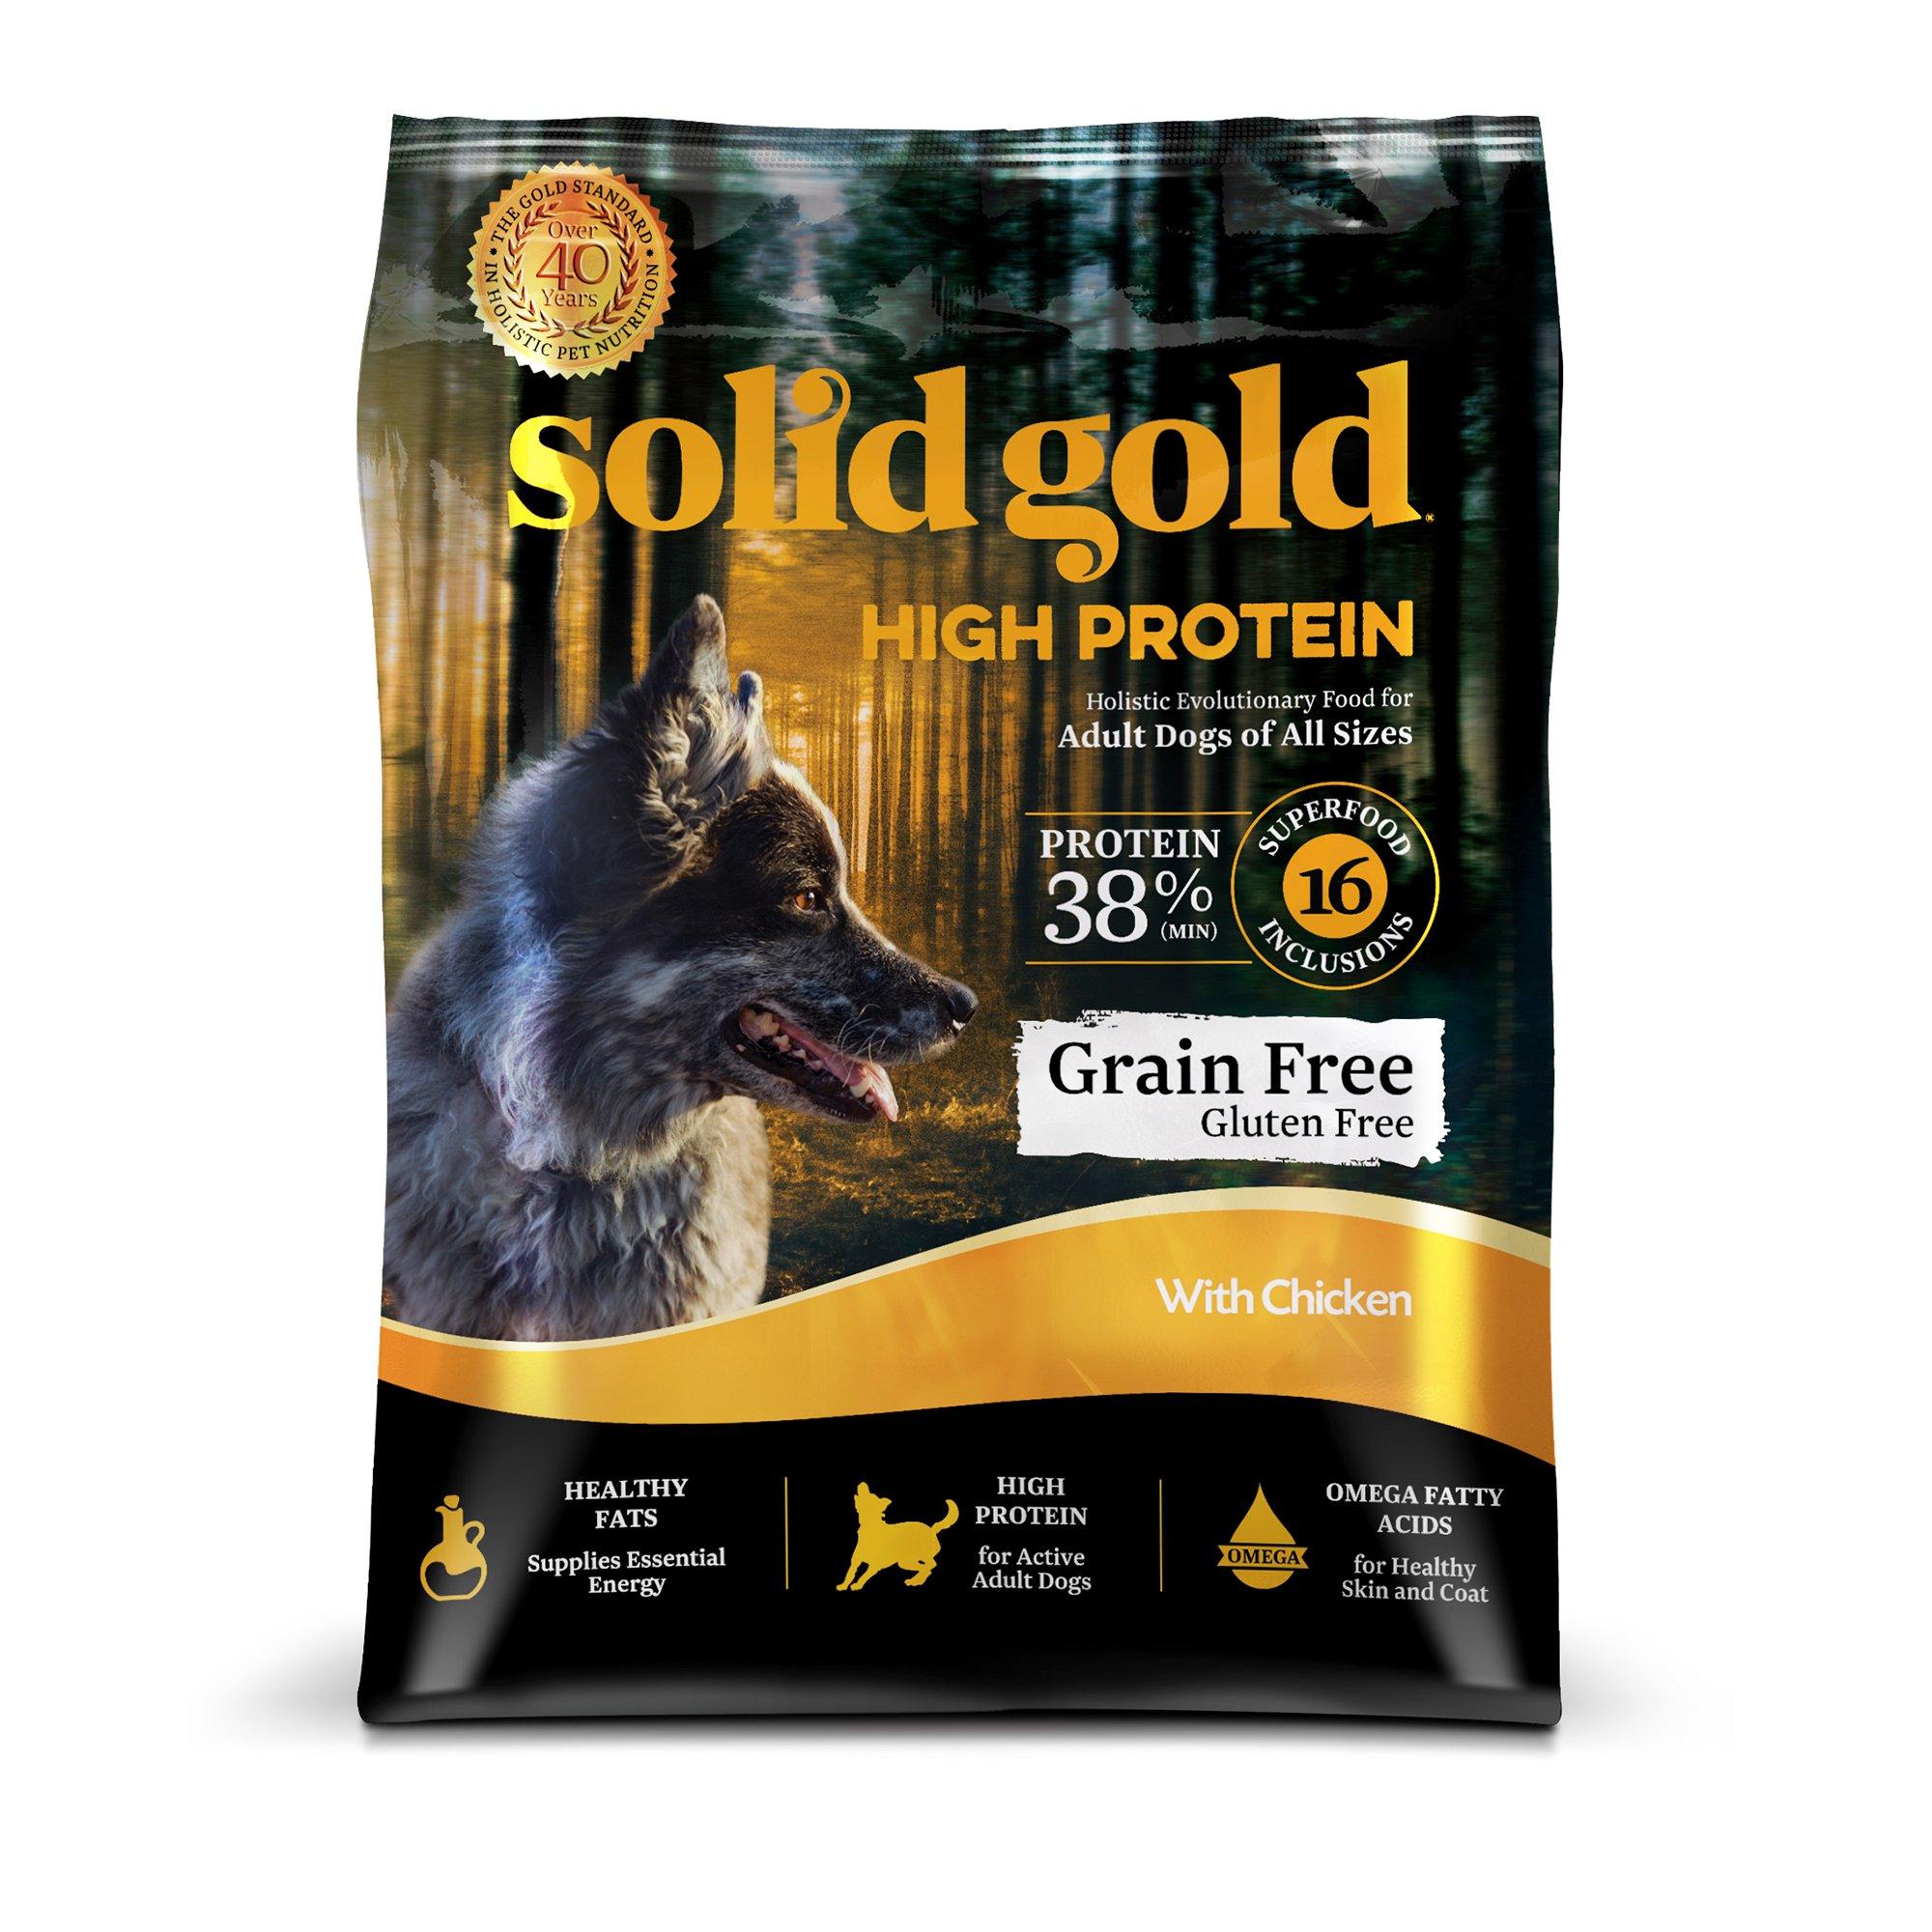 Solid Gold High Protein Chicken Dog Food